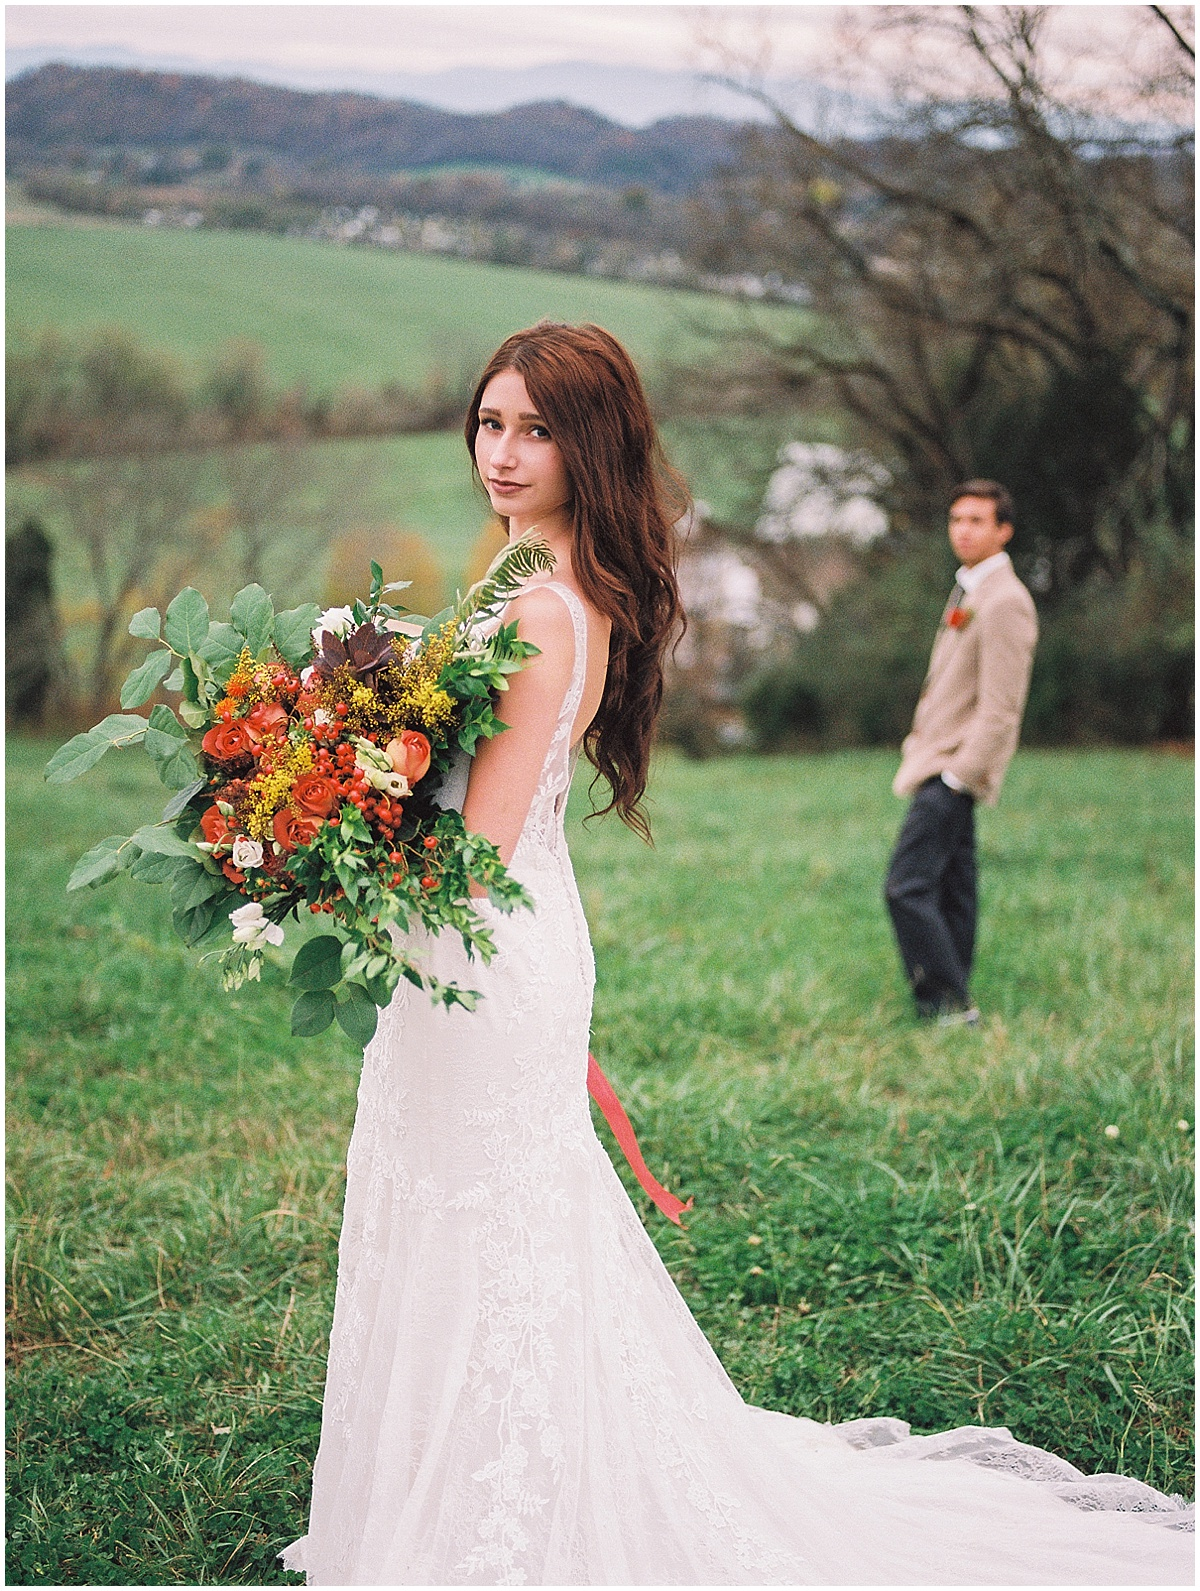 Abigail_Malone_Fall_Wedding_Knoxville_Film_Portra_400_Kodak_Mountain_Views_Abby_Elizabeth-5.jpg